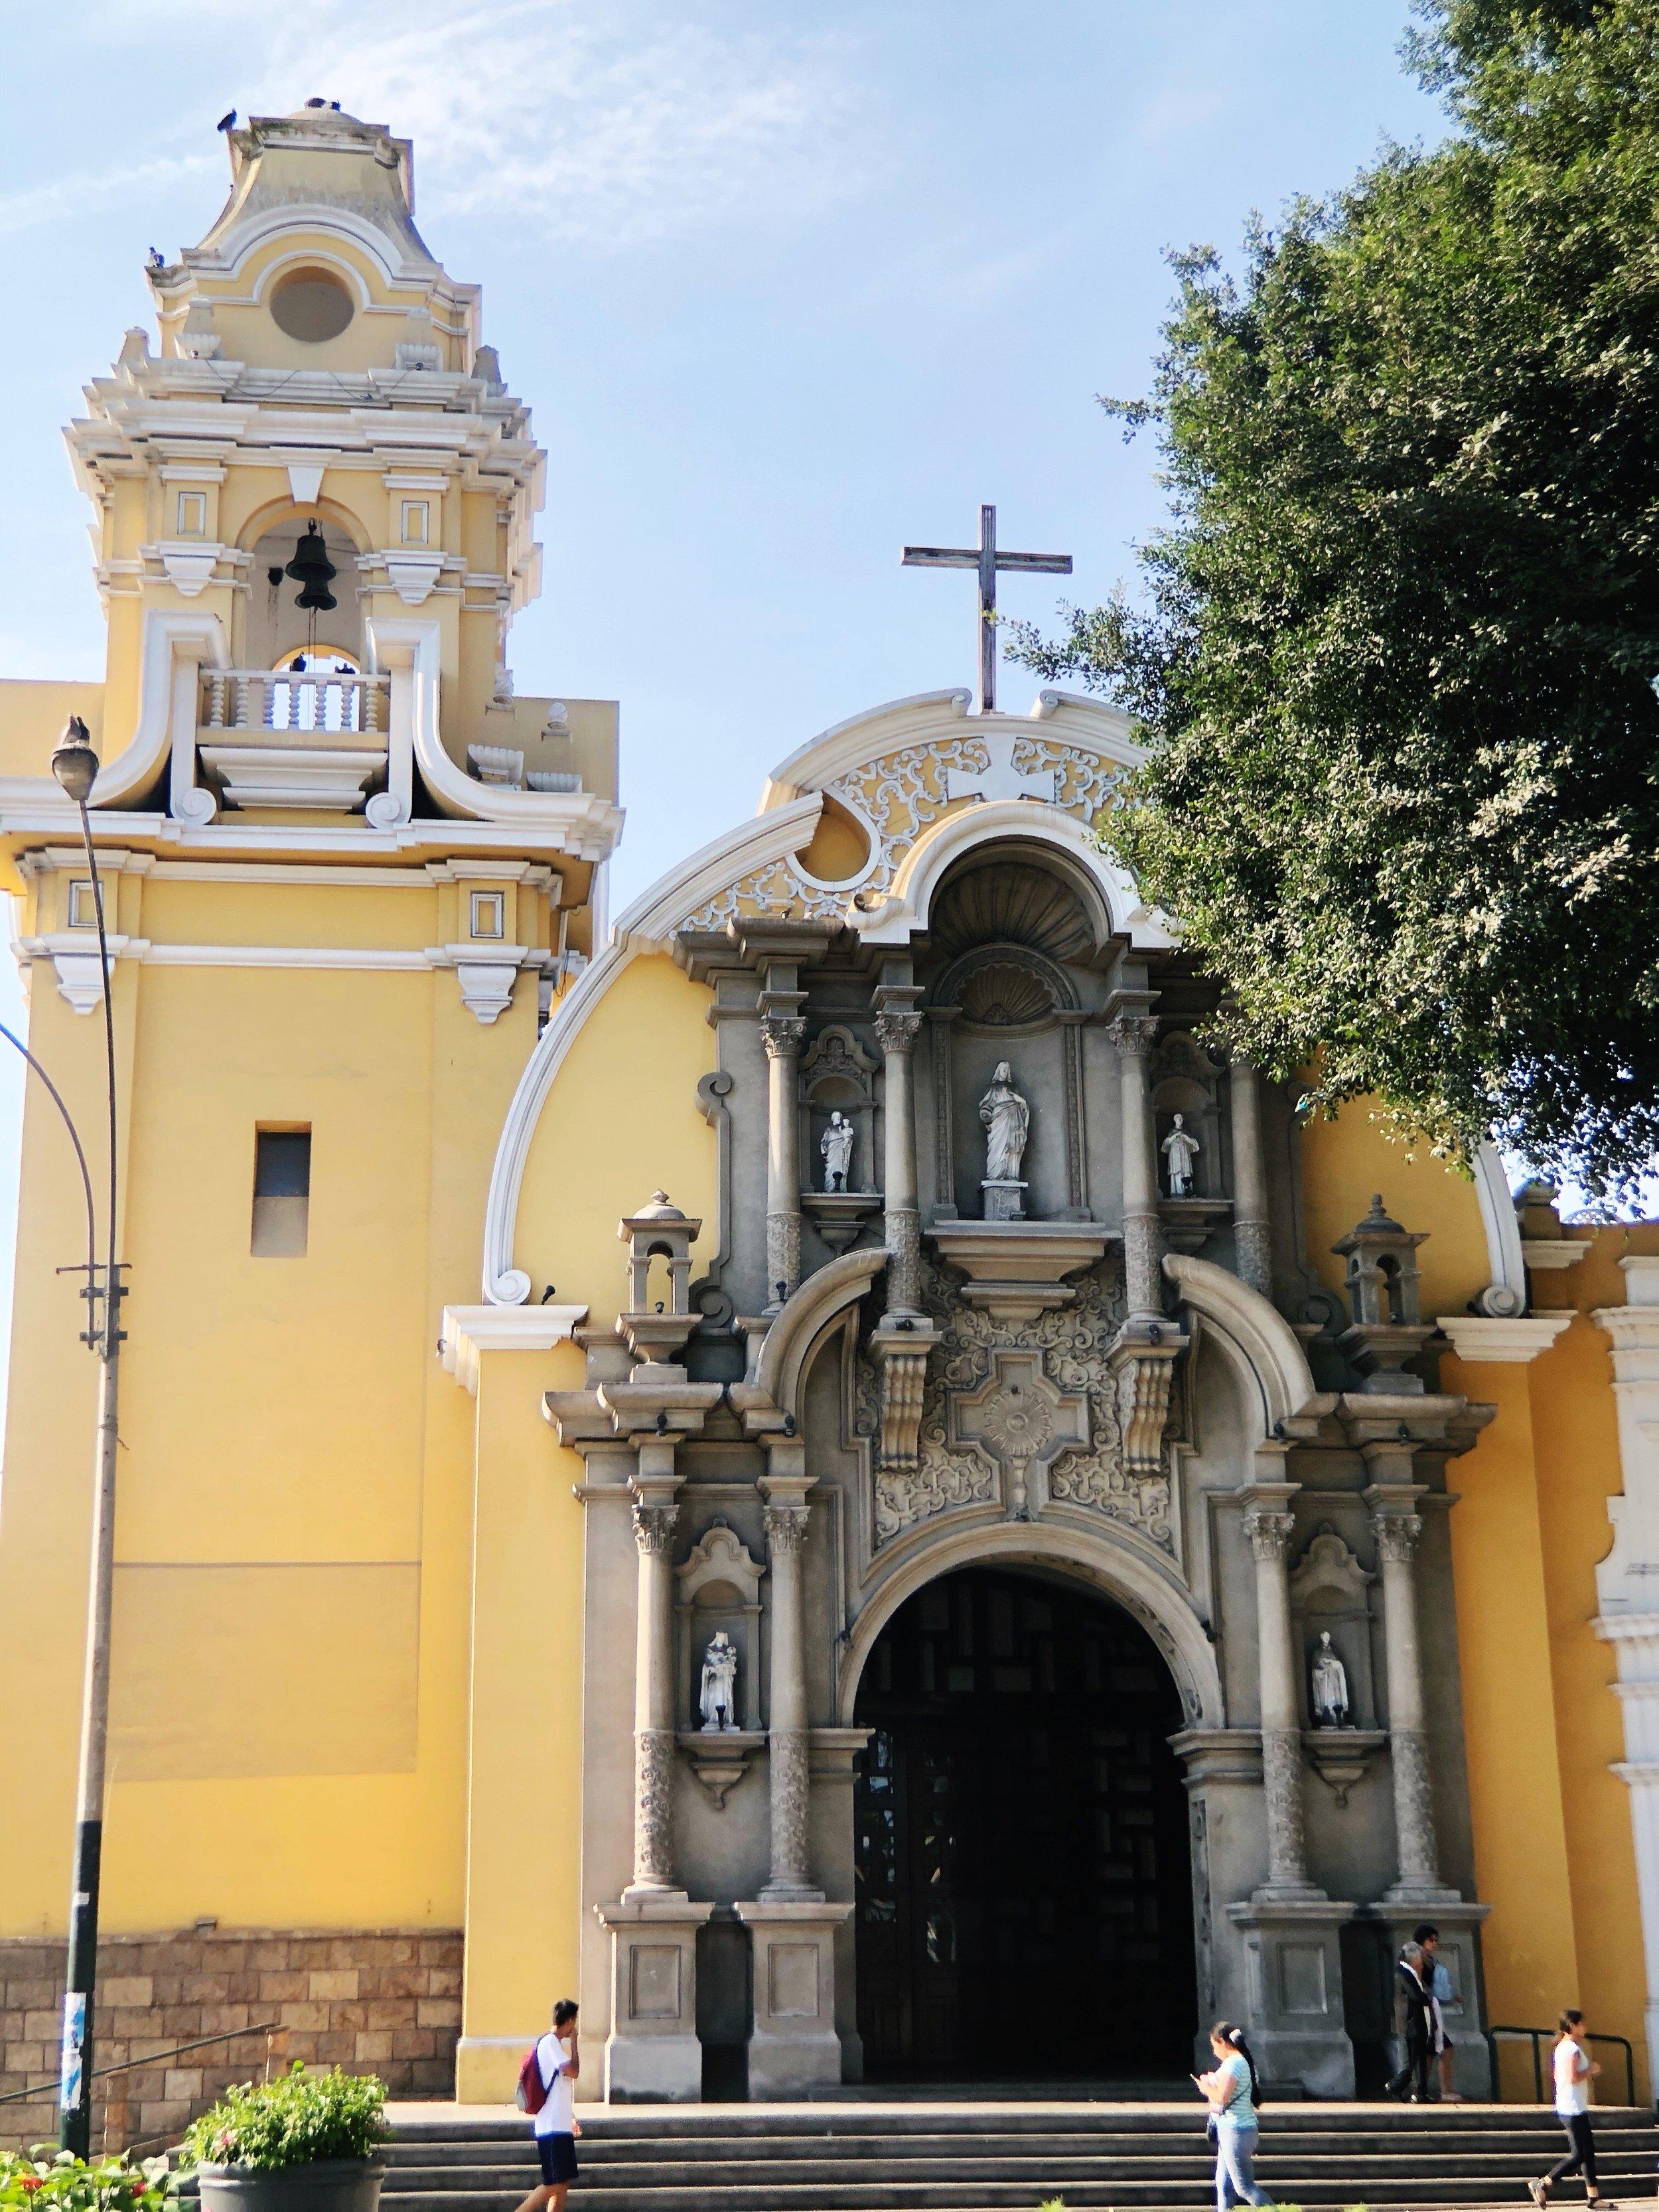 barranco-south america-lima-peru-travel tips